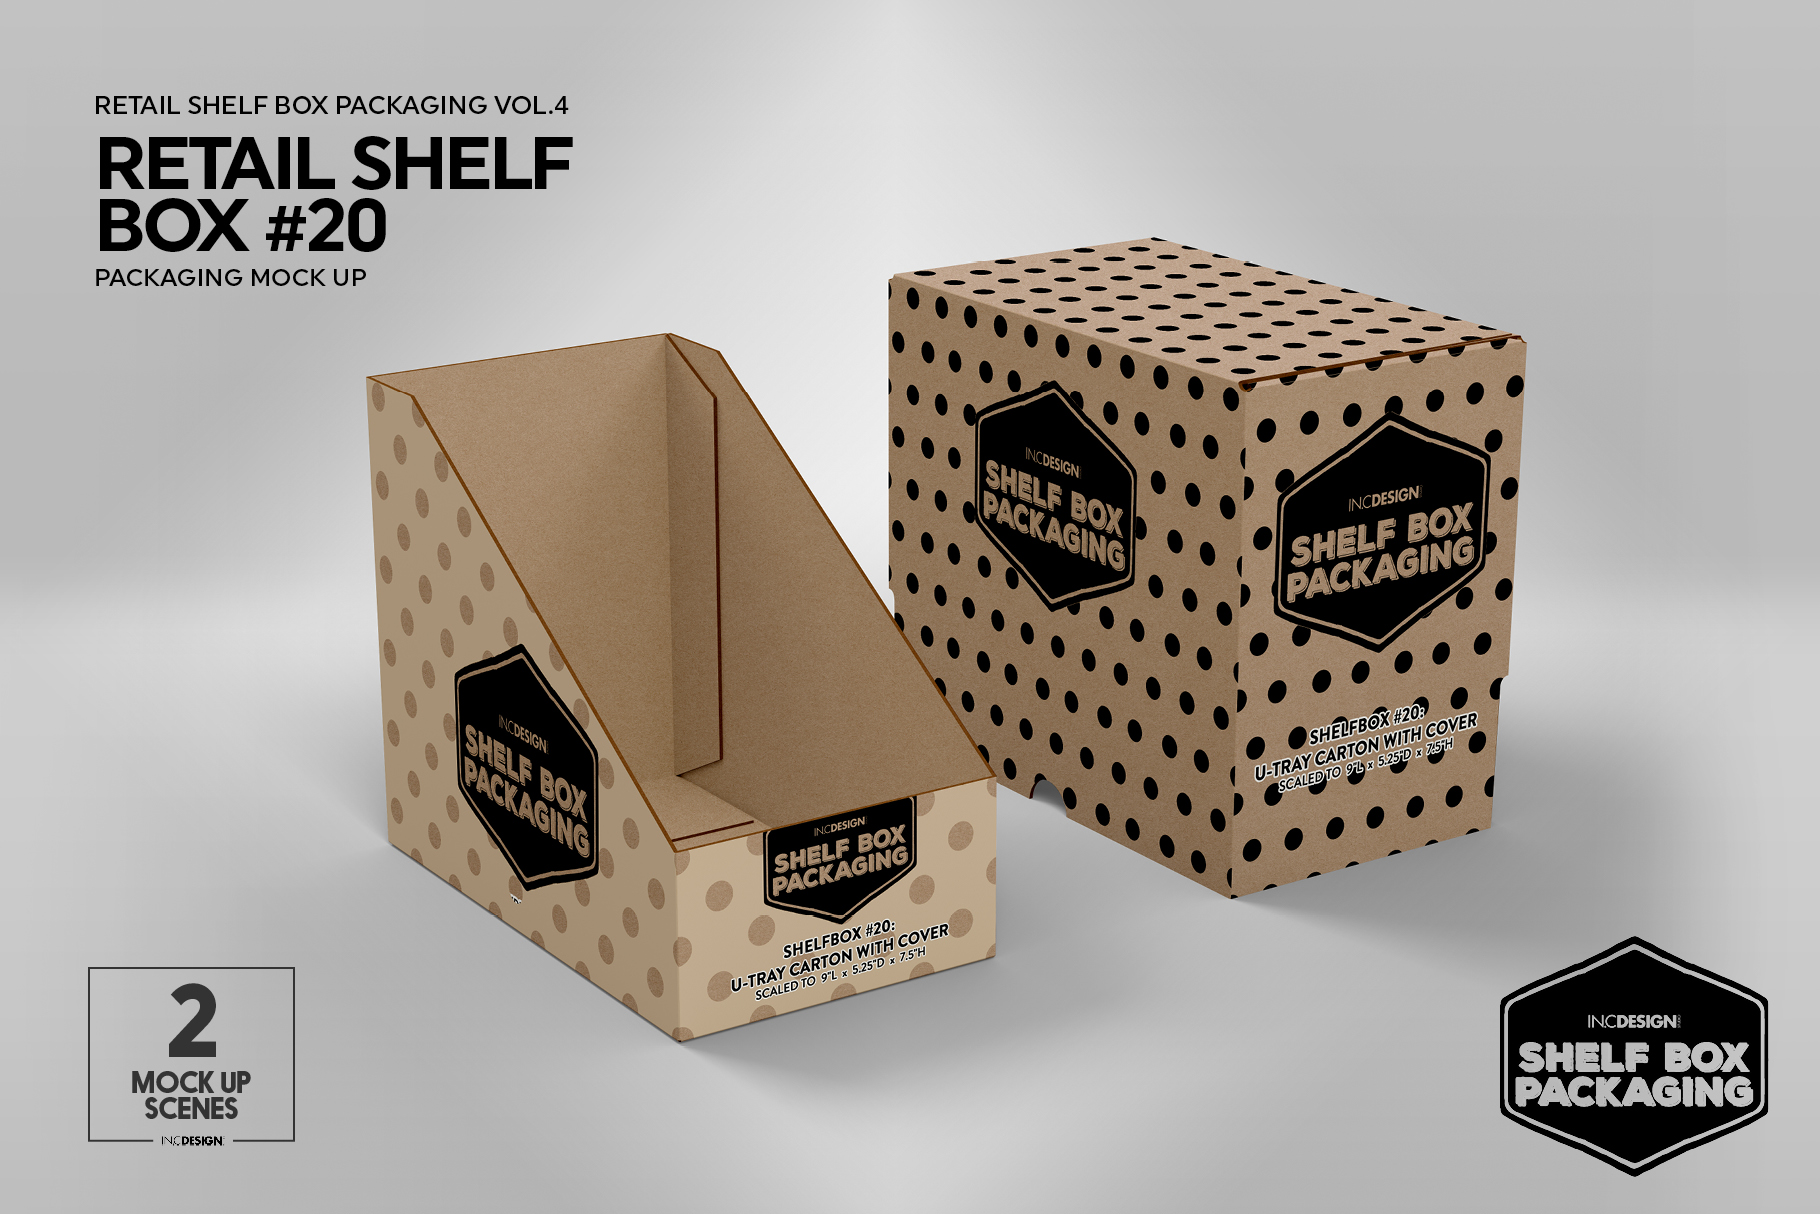 Retail Shelf Box 20 Packaging Mockup example image 6